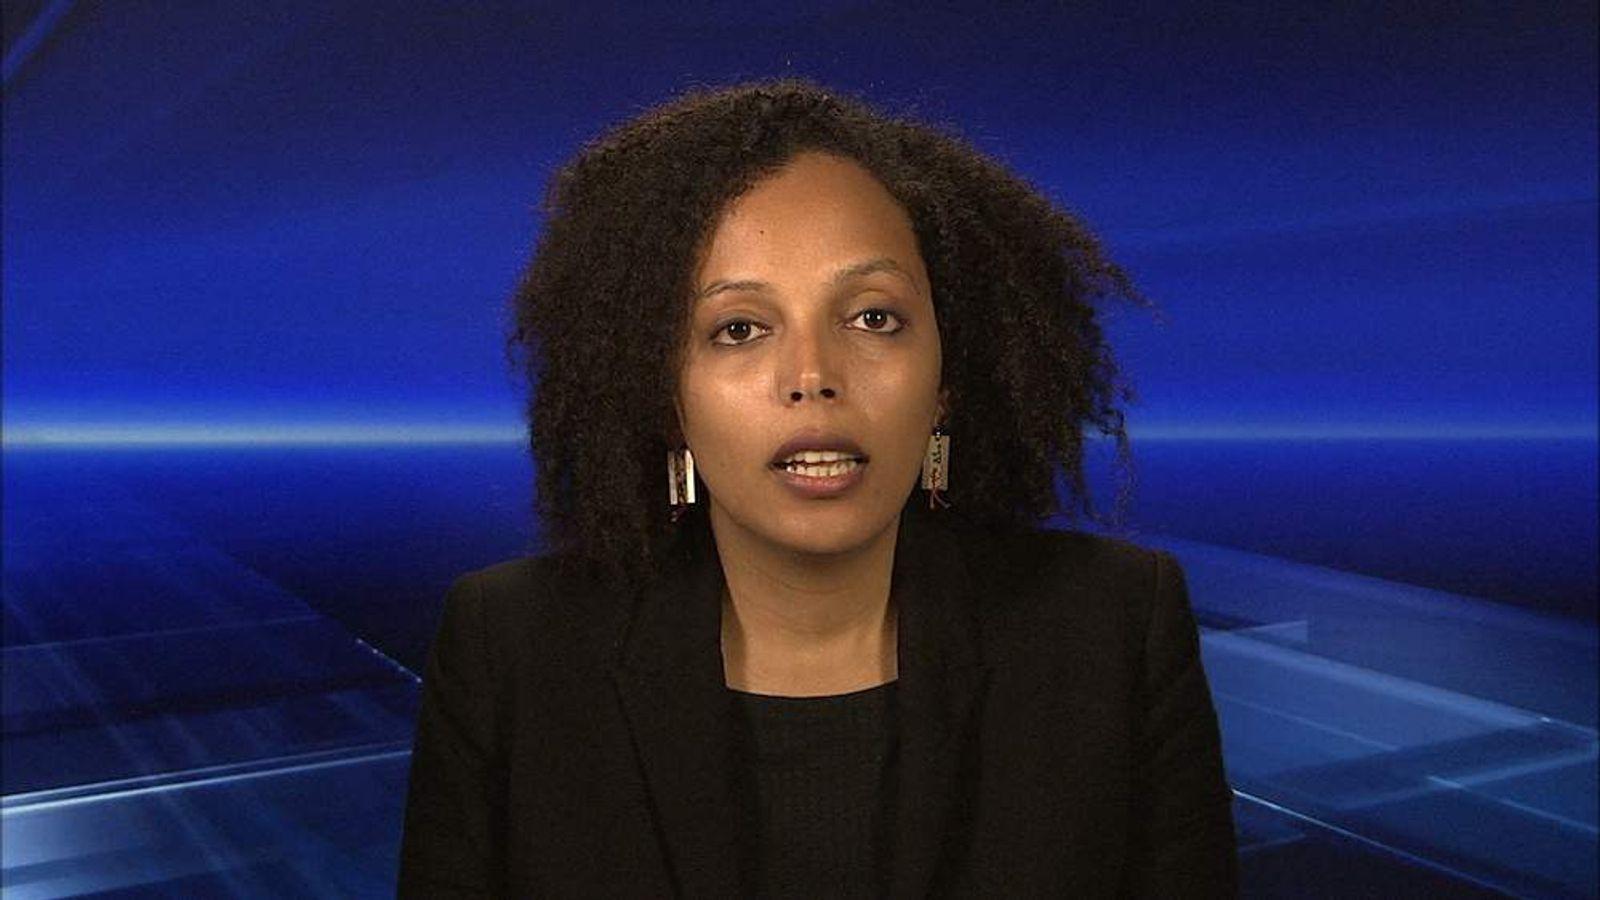 Manar Idriss, Amnesty International UK